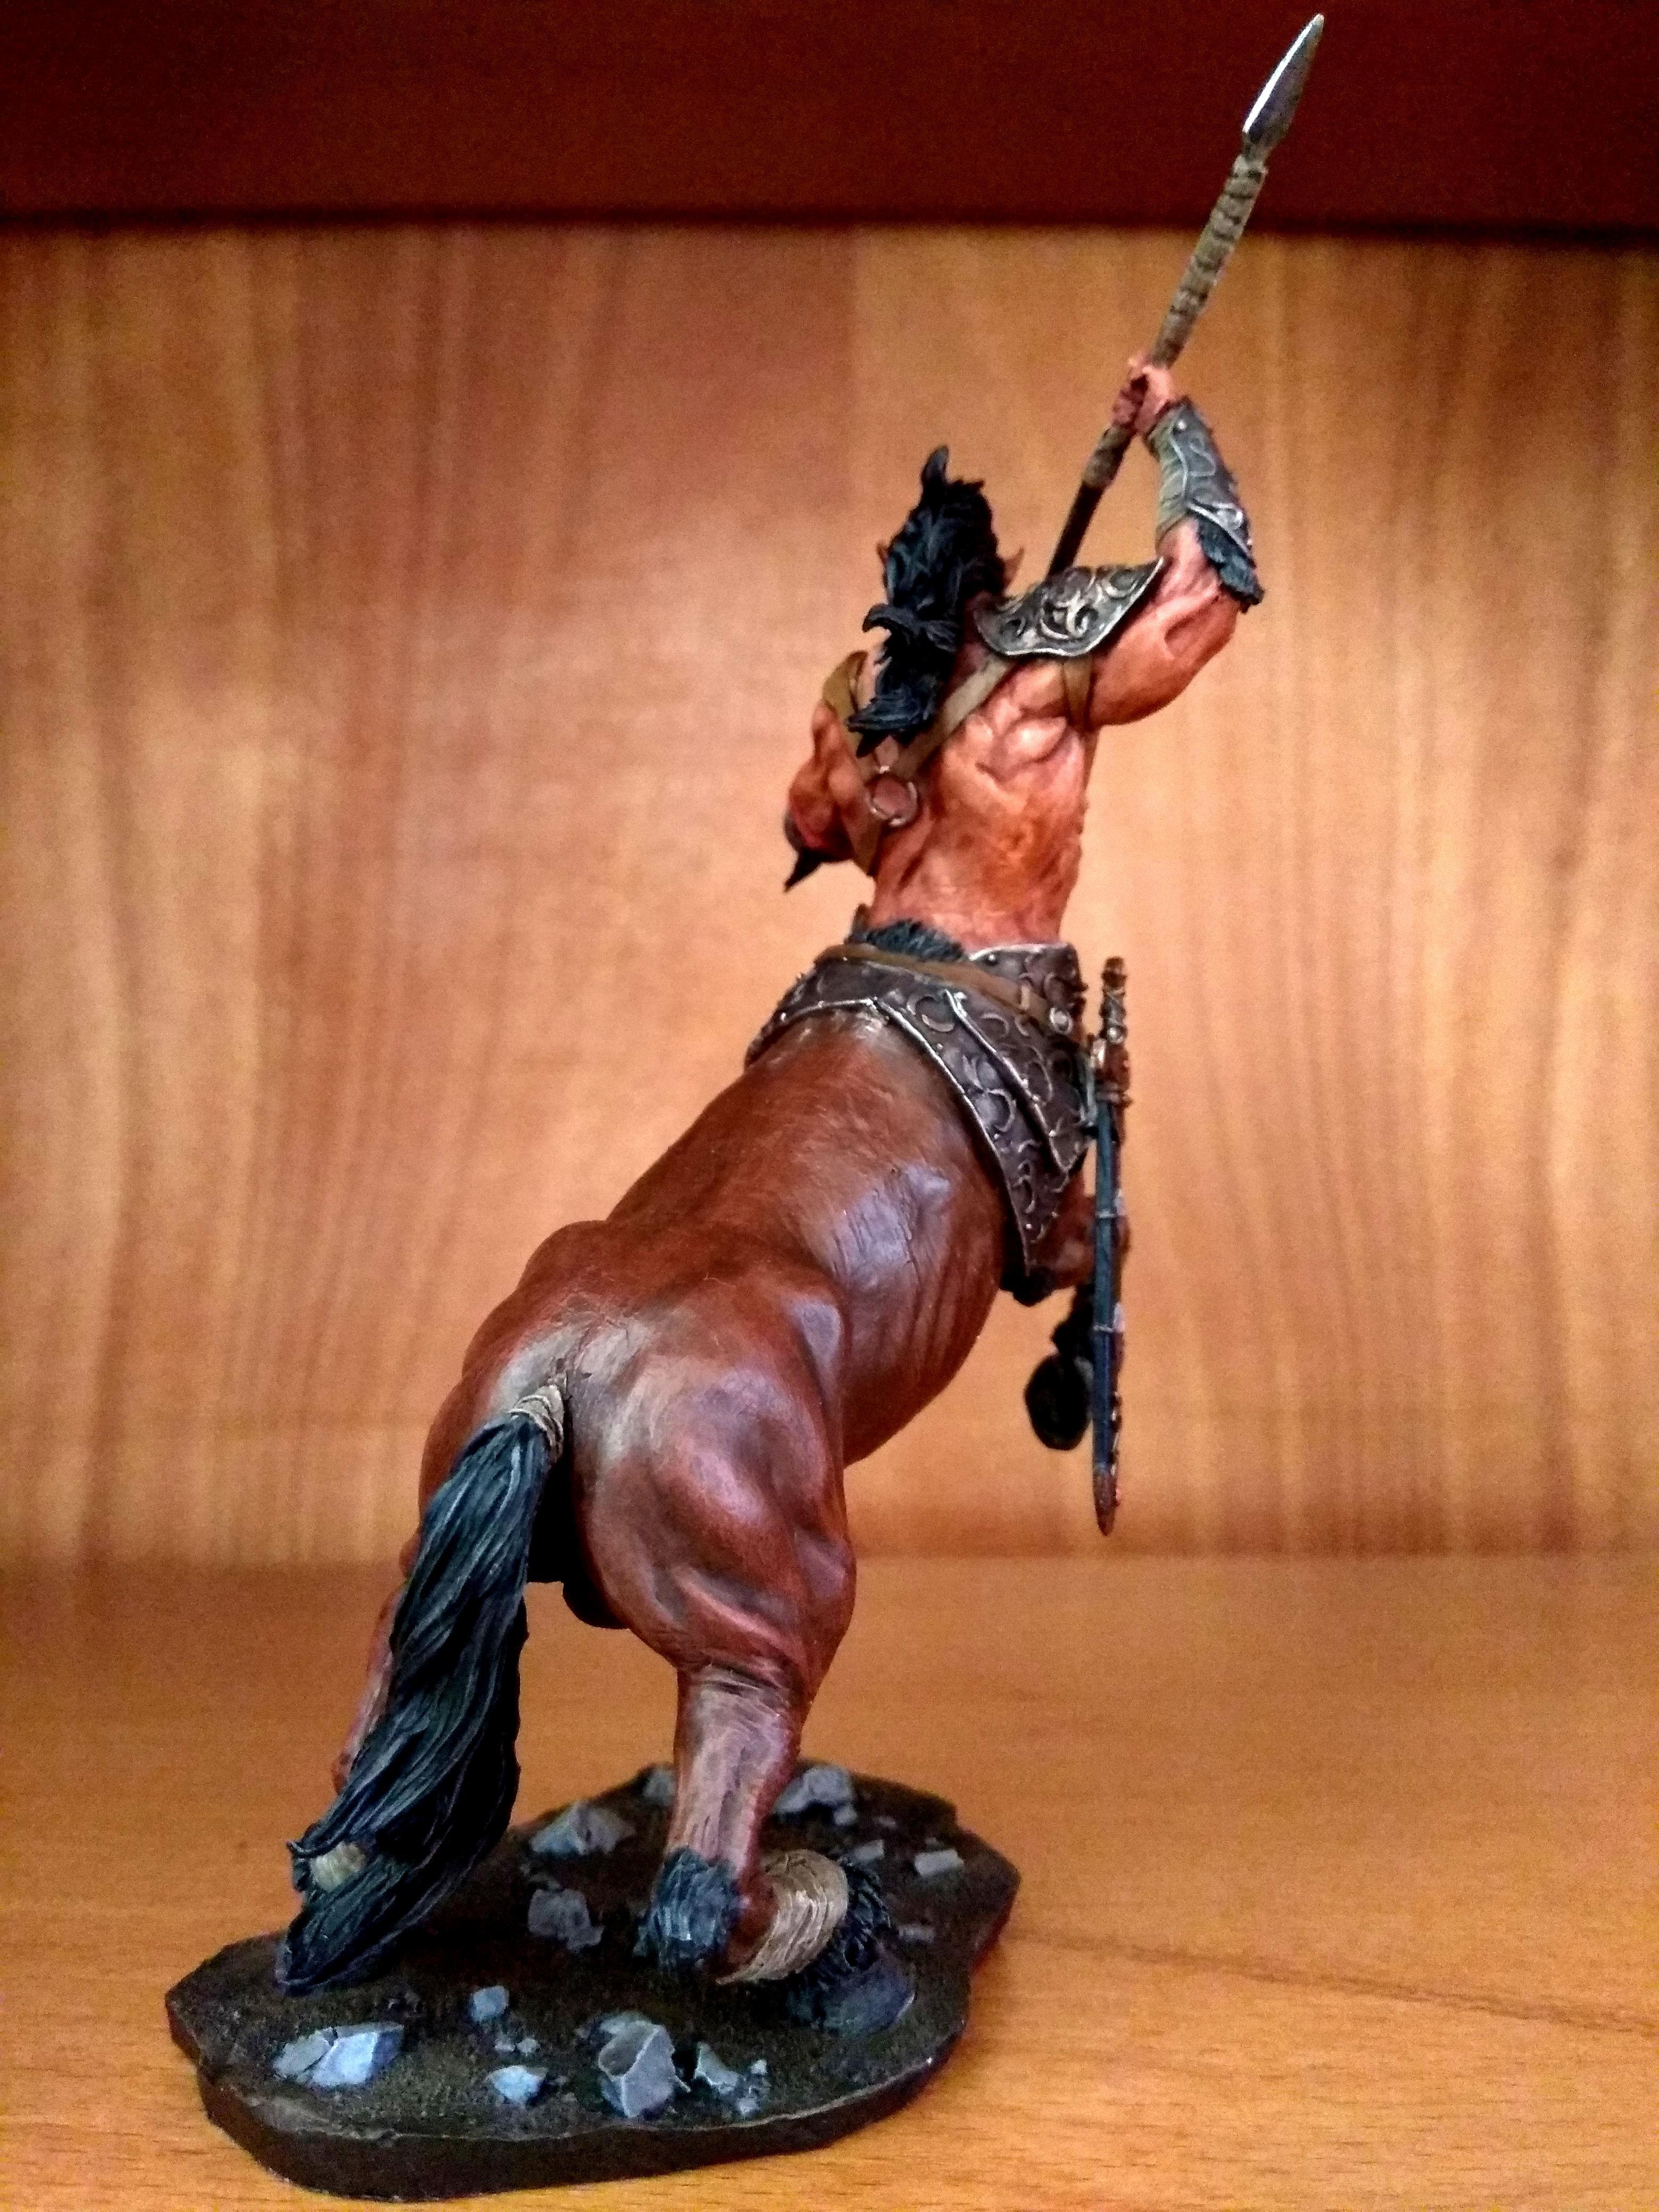 75mm, Black, Centaur, Miniature, Sun